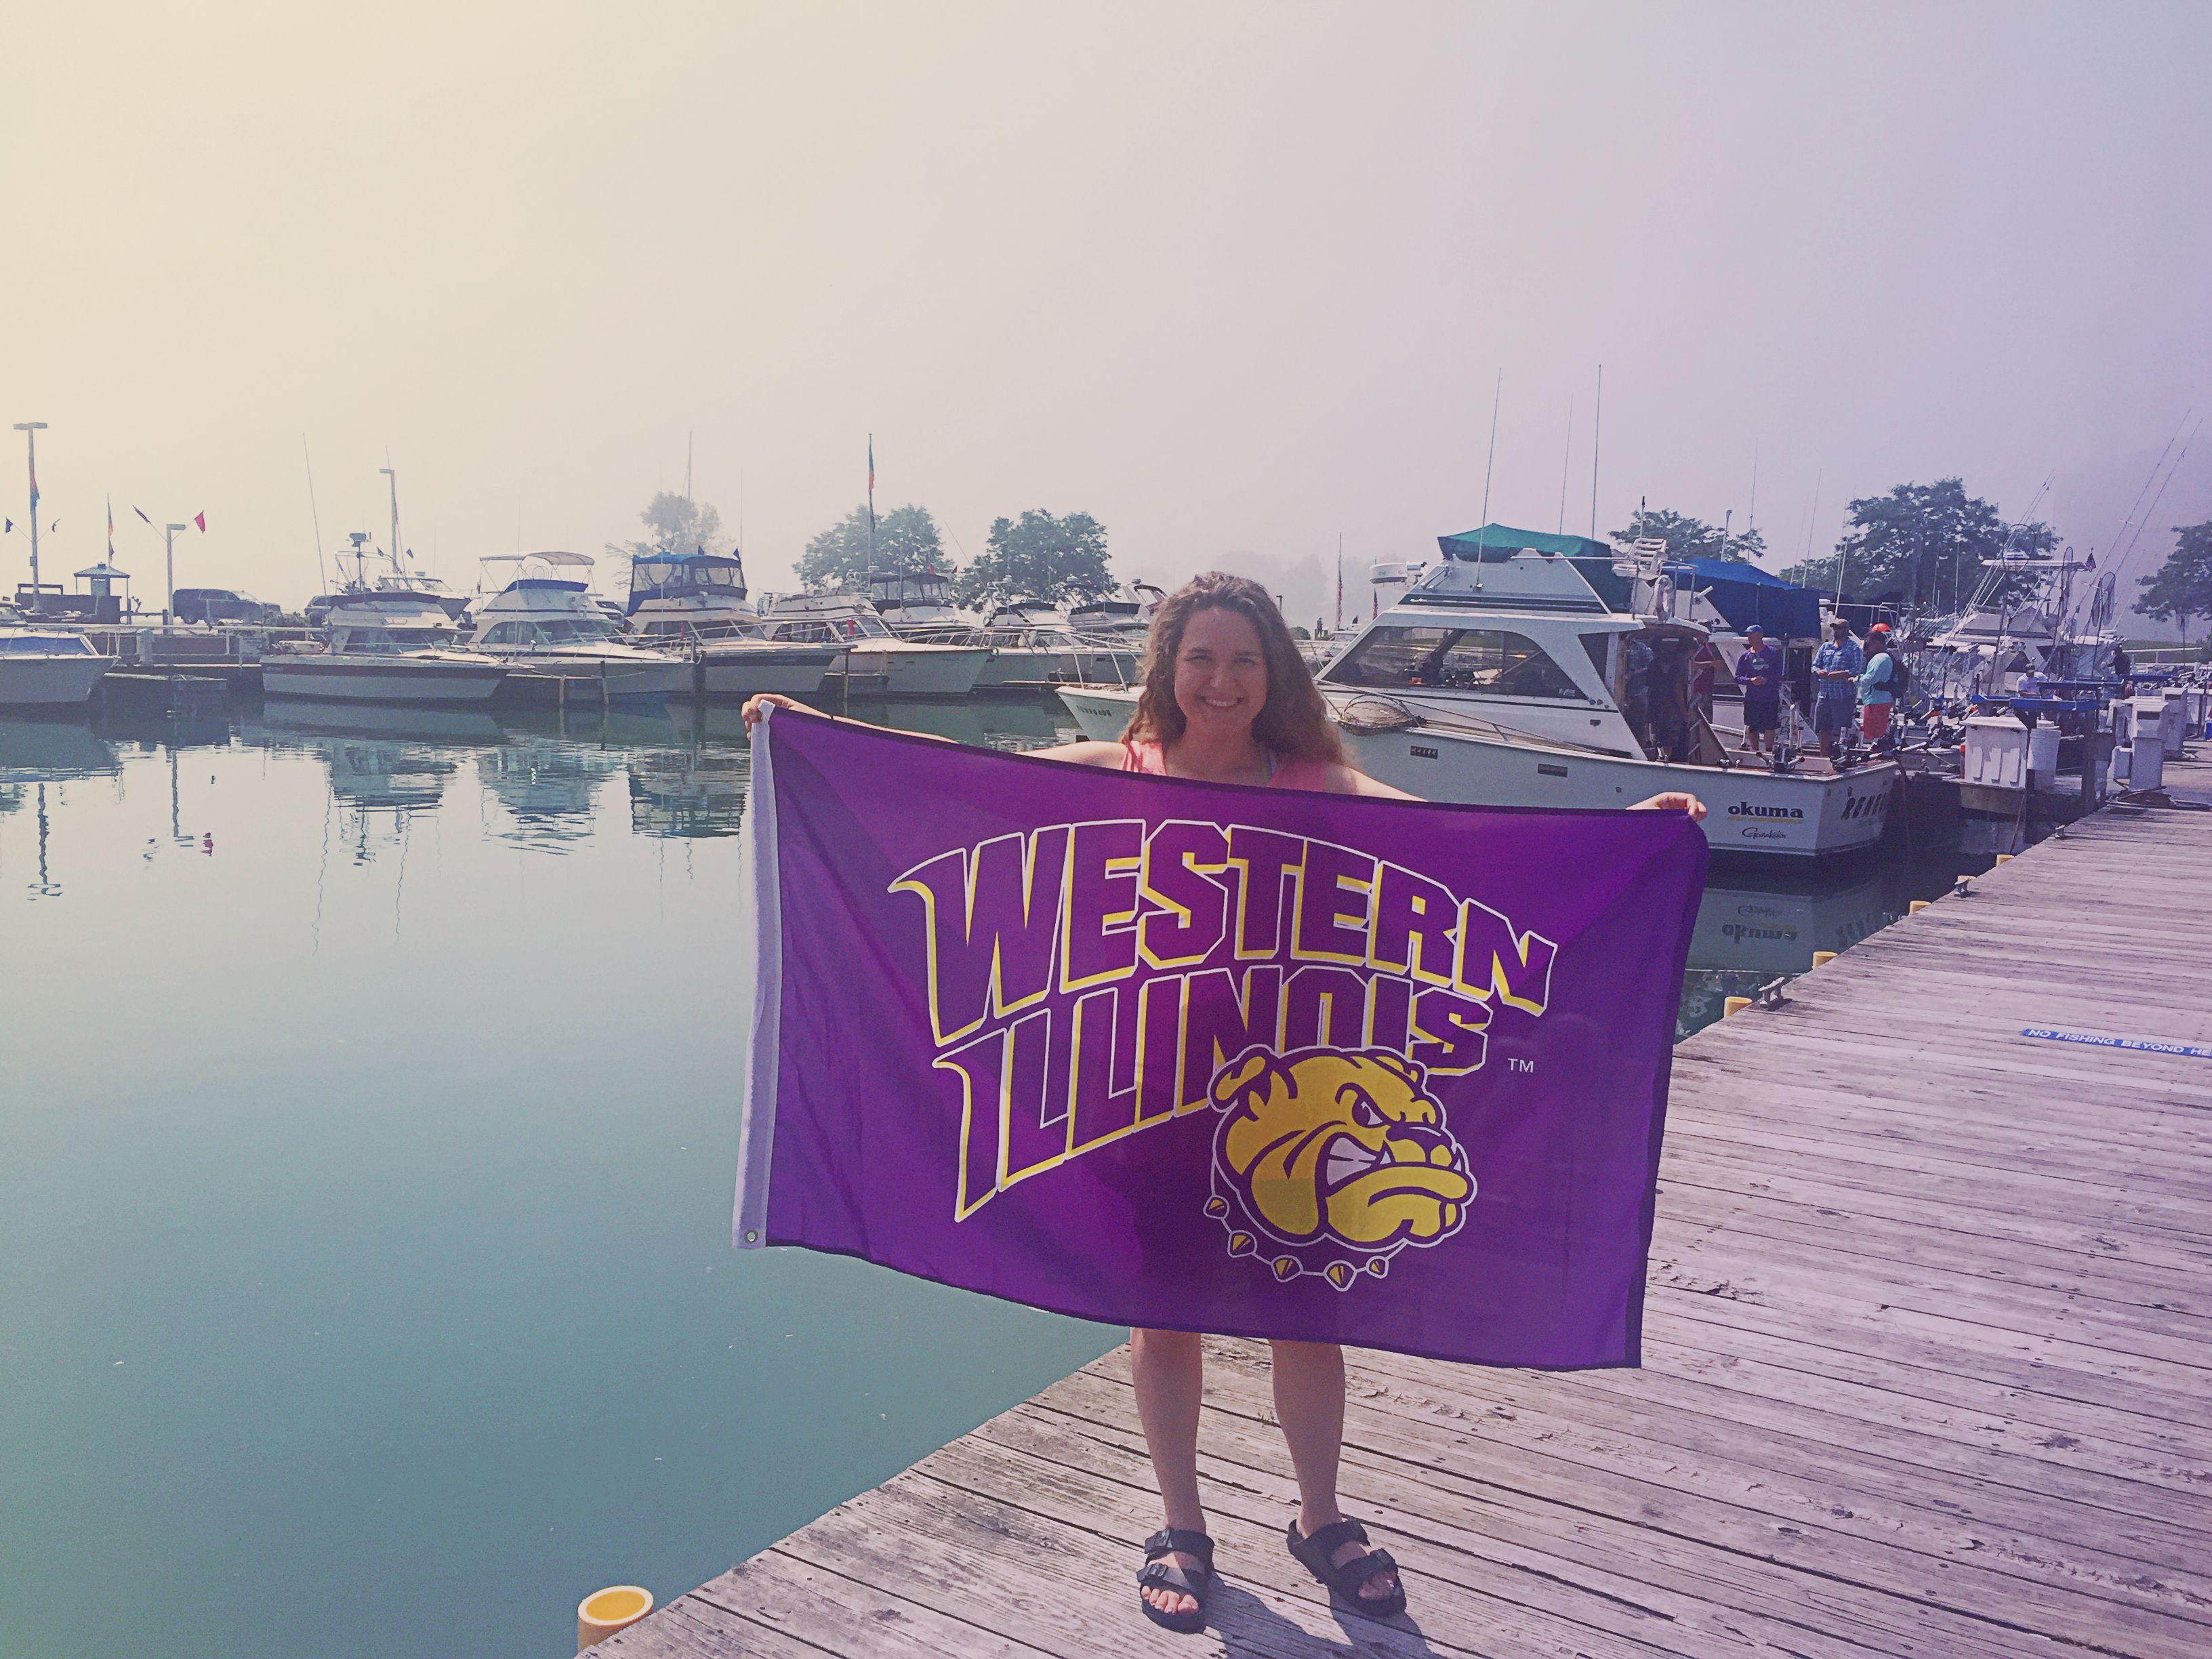 Representing Western Illinois University in Port